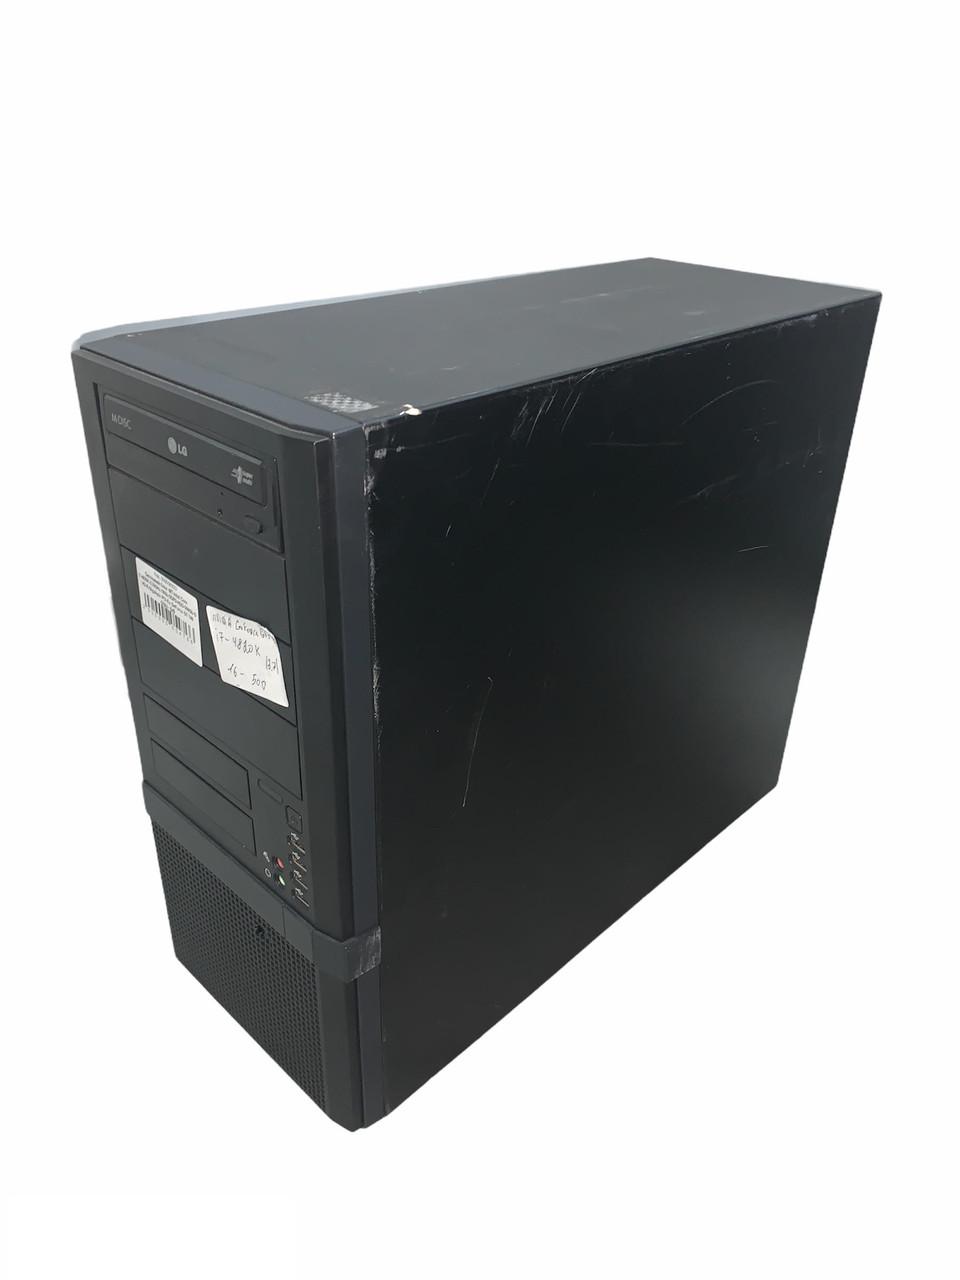 Системный блок -MT-Intel Core i7-4820K-3,70GHz-16Gb-DDR3-HDD-500Gb-DVD-R-Gigabyte PCI-Ex GeForce GT 740 (2Gb)-